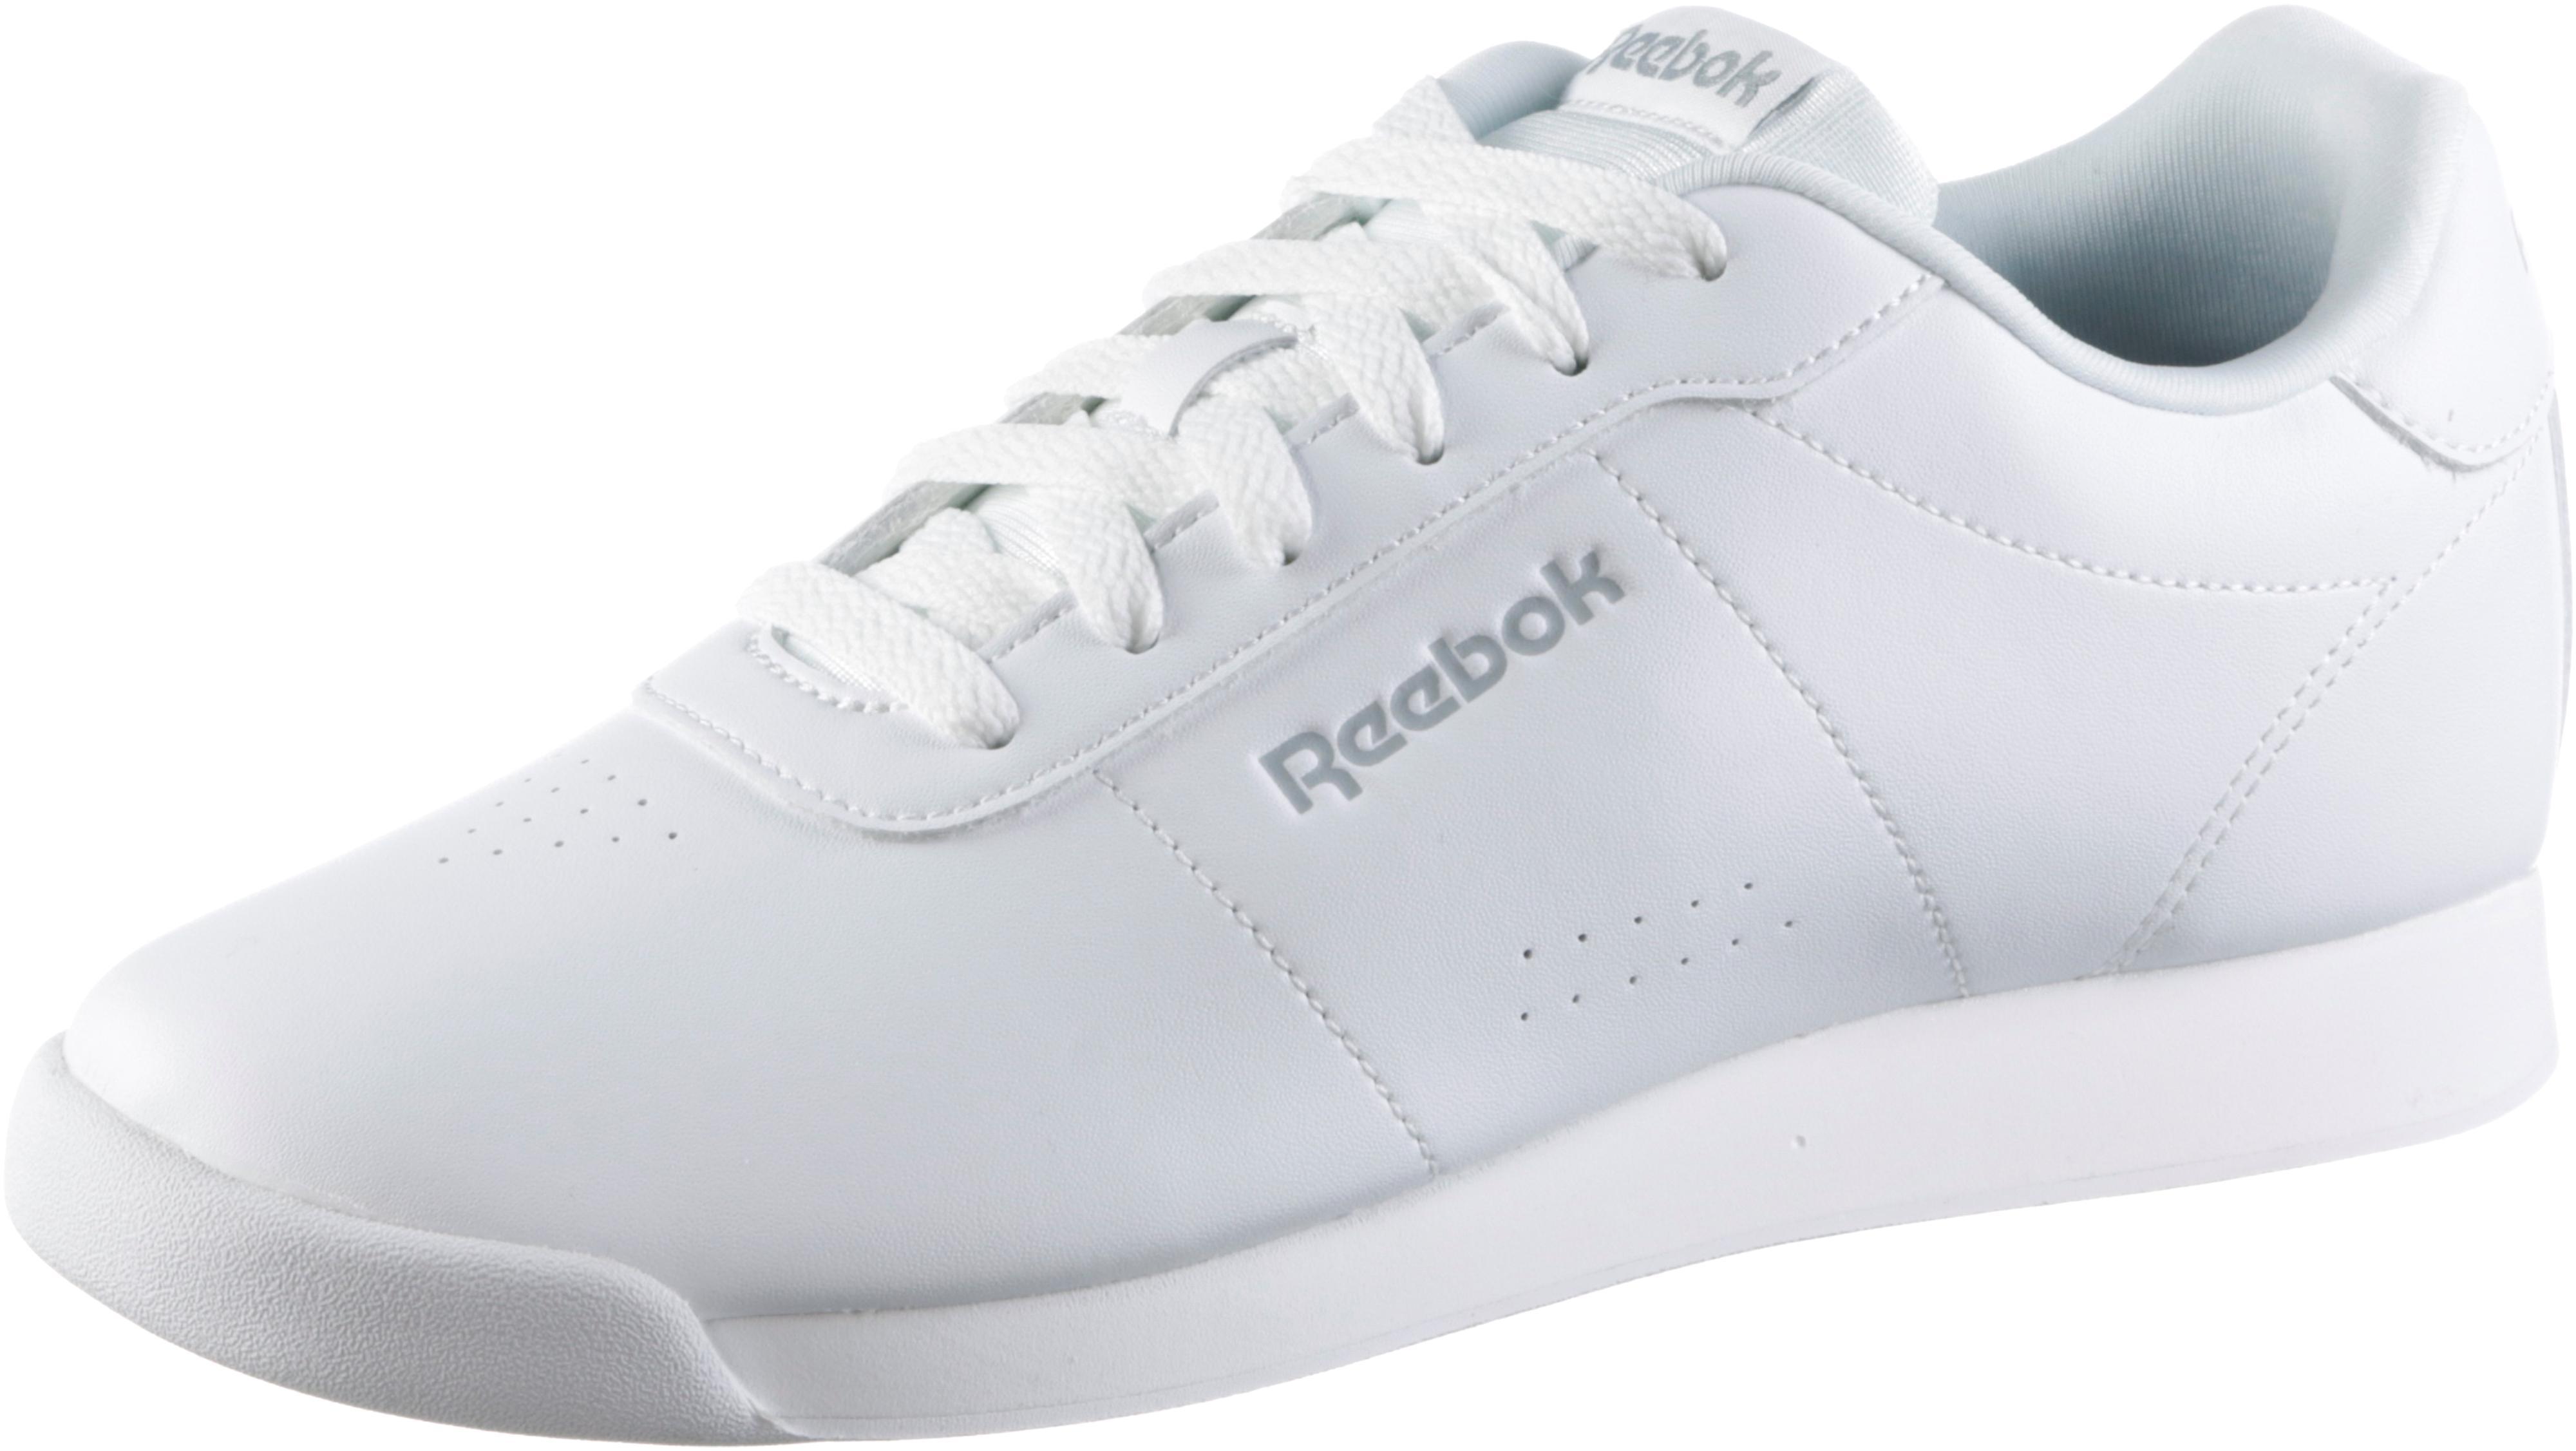 Reebok im Royal Charm Sneaker Damen schwarz im Reebok Online Shop von 3d2a93